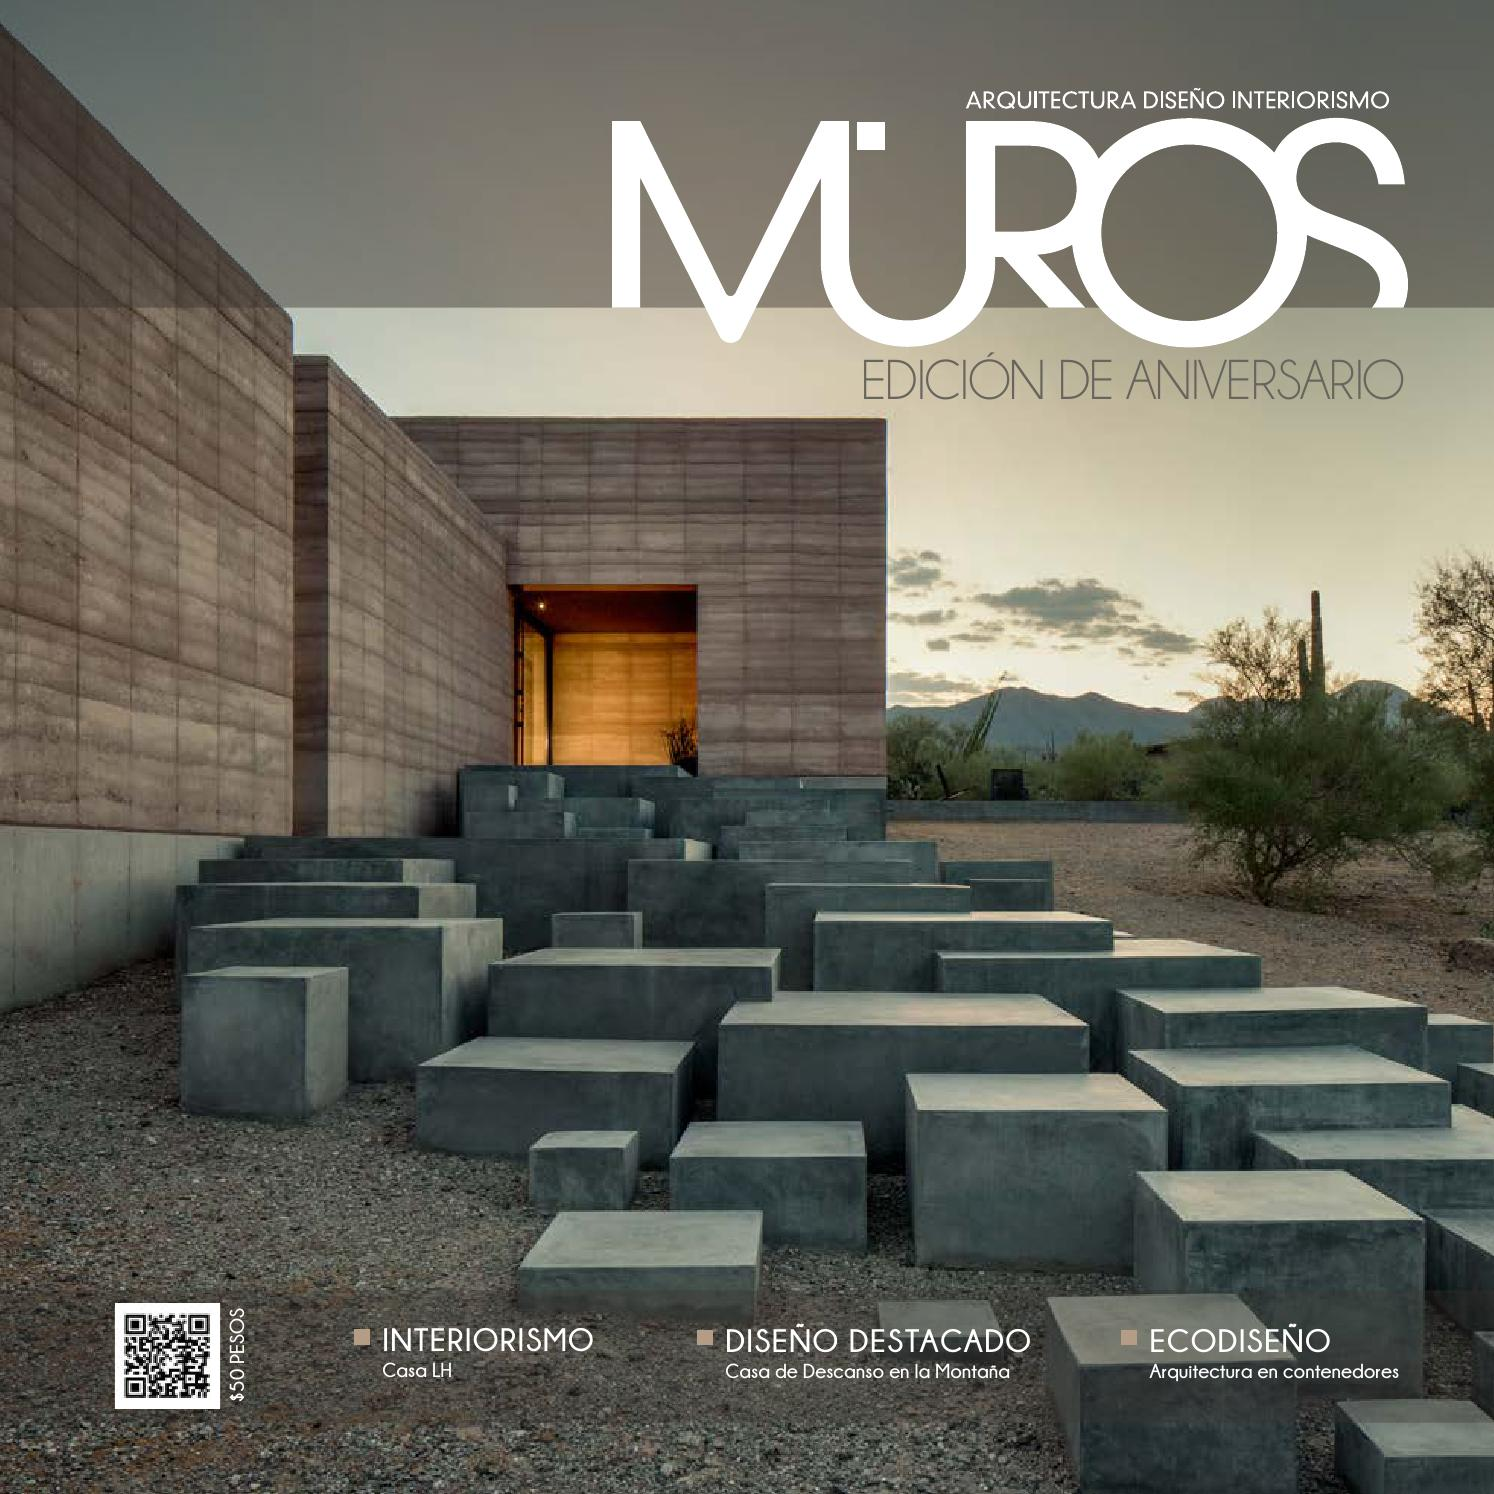 Edici n 6 aniversario revista muros arquitectura for Arquitectura y diseno de hoteles